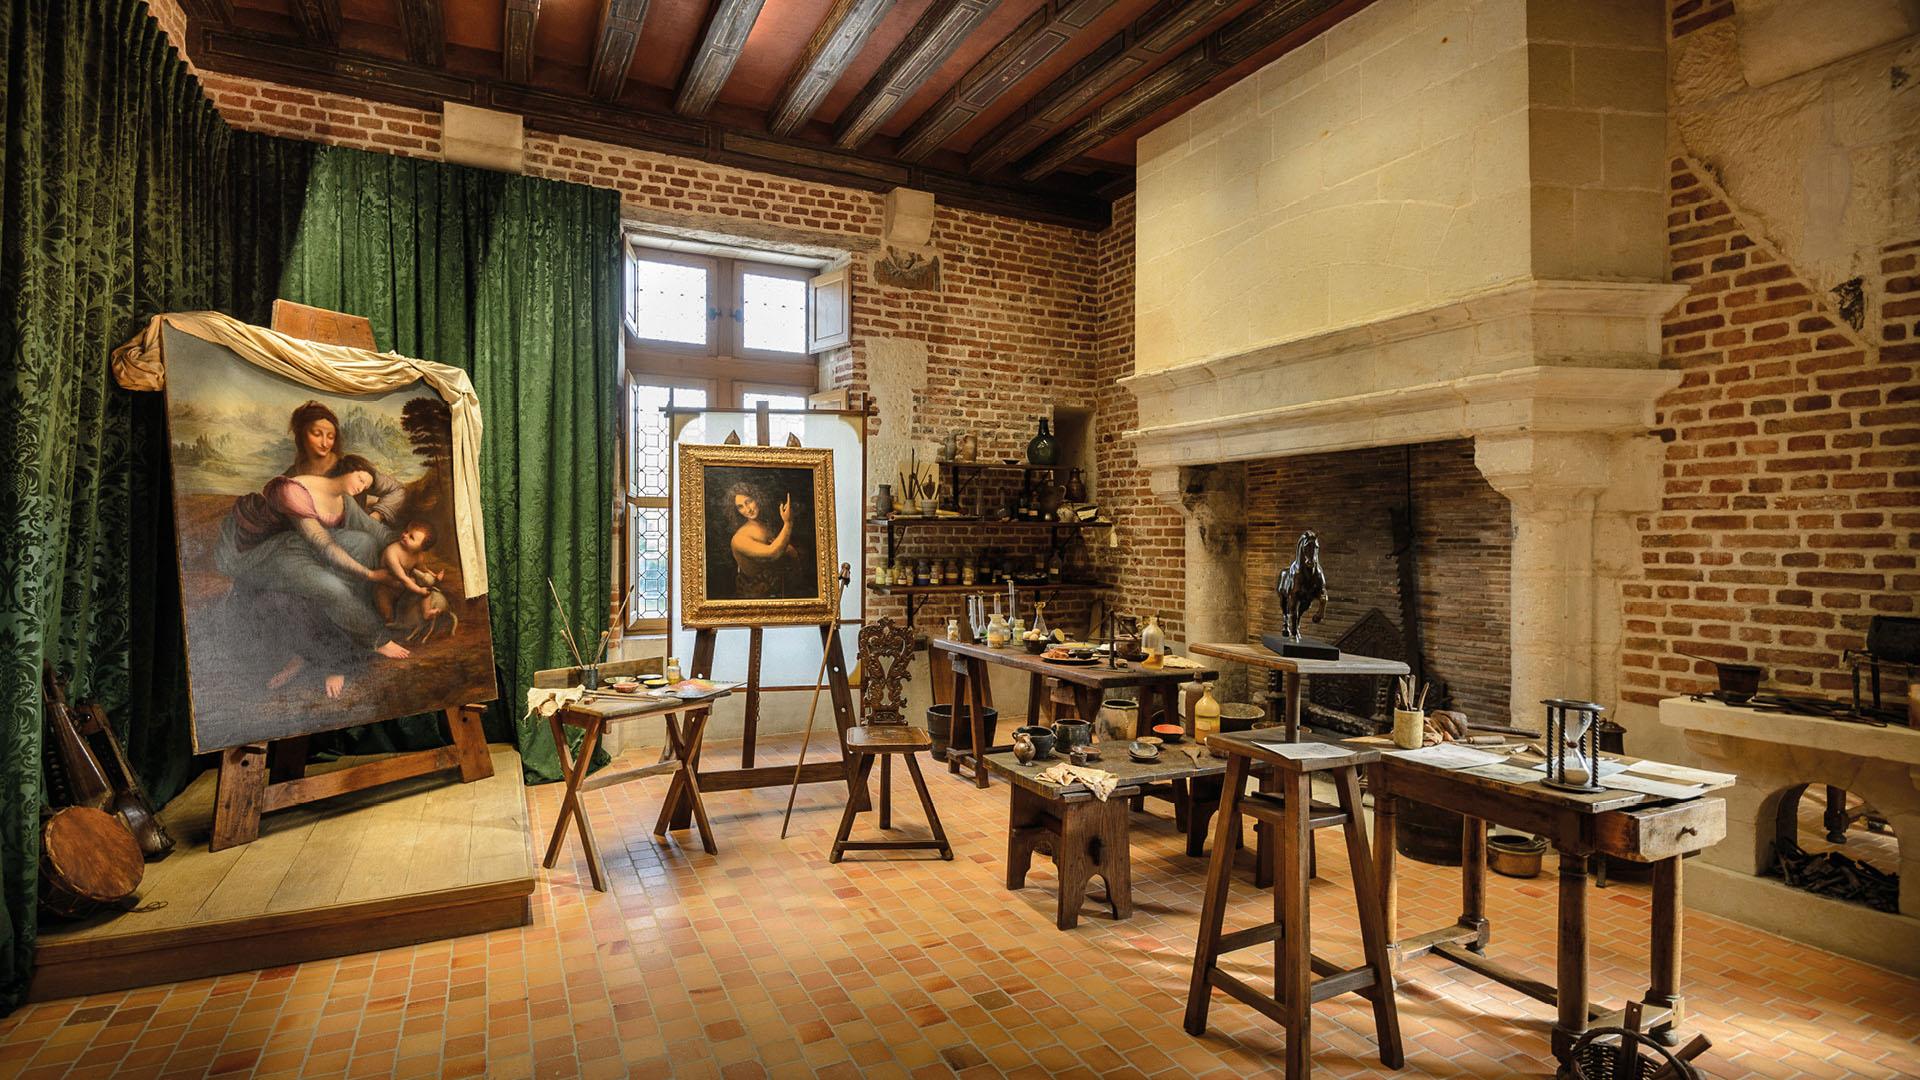 Leonardo da Vinci's studio, in the Clos Lucé